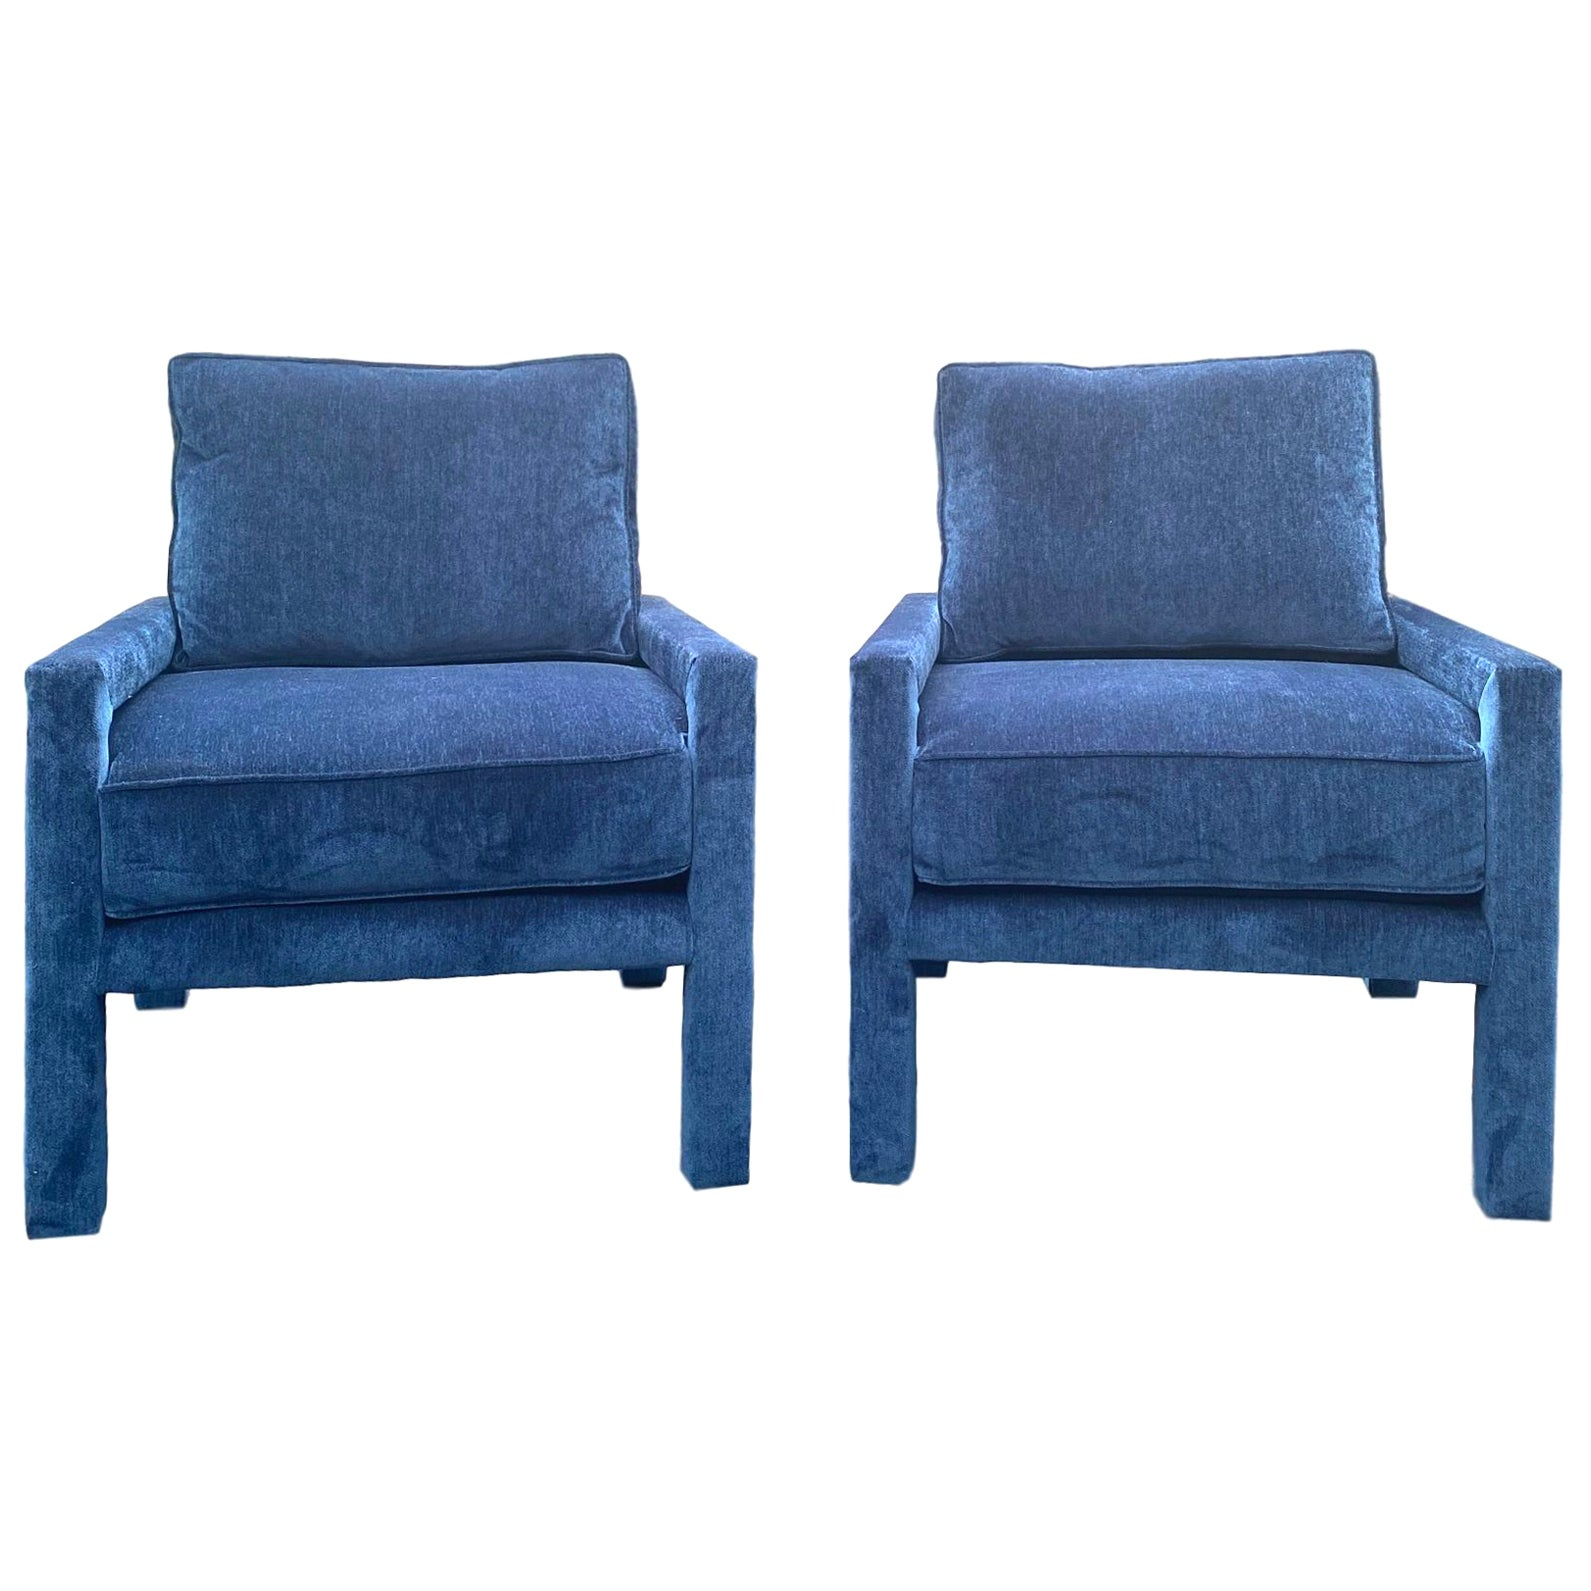 Pair of New Milo Baughman Style Iconic Parsons Chairs, Pantone Blue Velvet